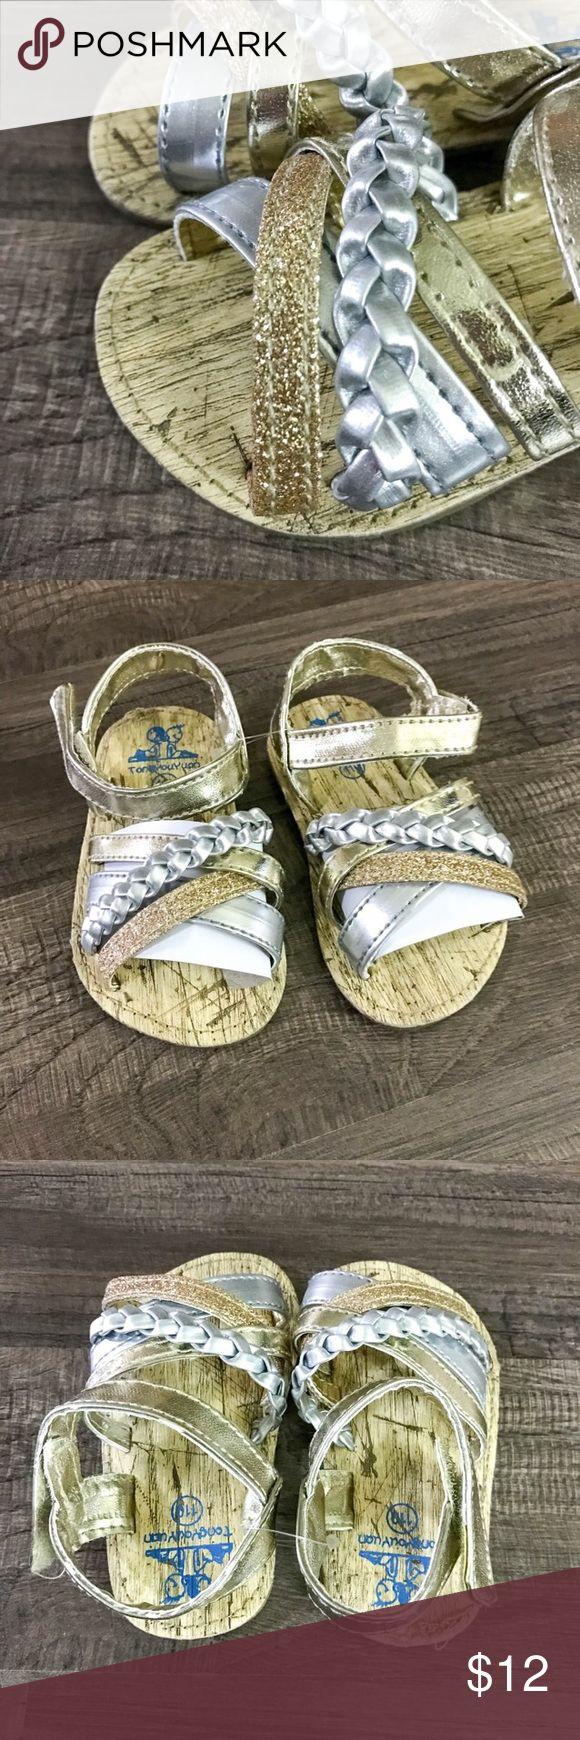 Gold & Silver Strappy Sandals NWOT glittery gold & silver strappy sandals, pictures do not do them justice! Size 3C #girlssandals #goldandsilver #glitter Shoes Sandals & Flip Flops